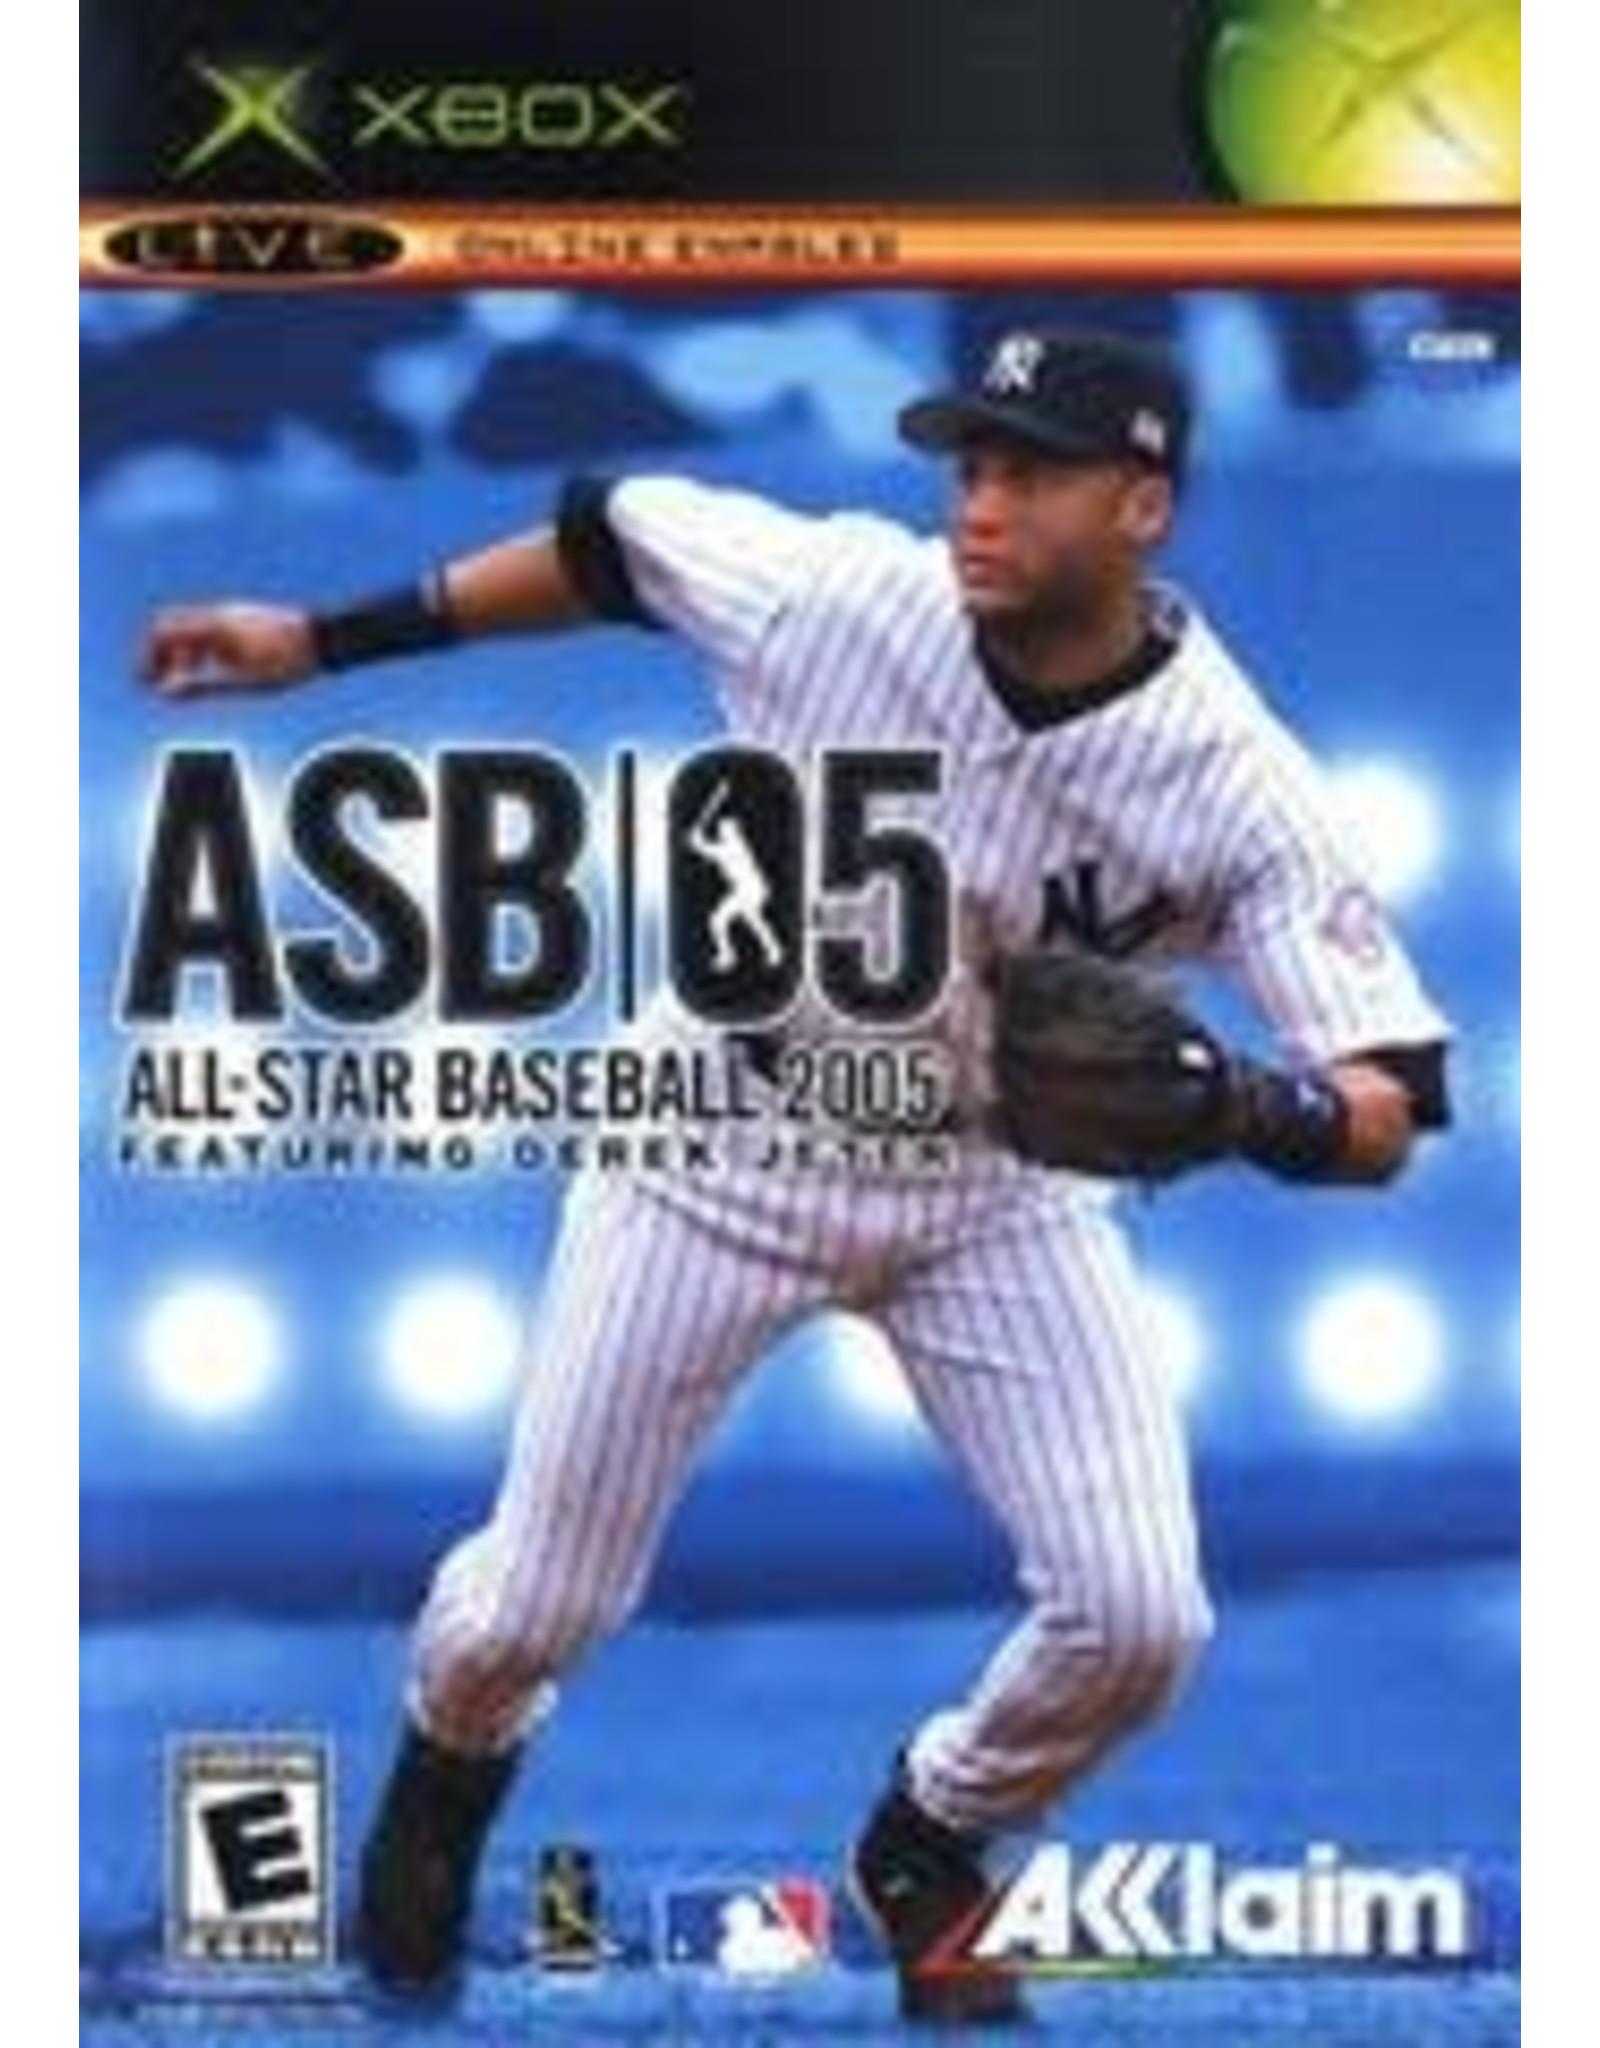 Xbox All-Star Baseball 2005 (CiB)